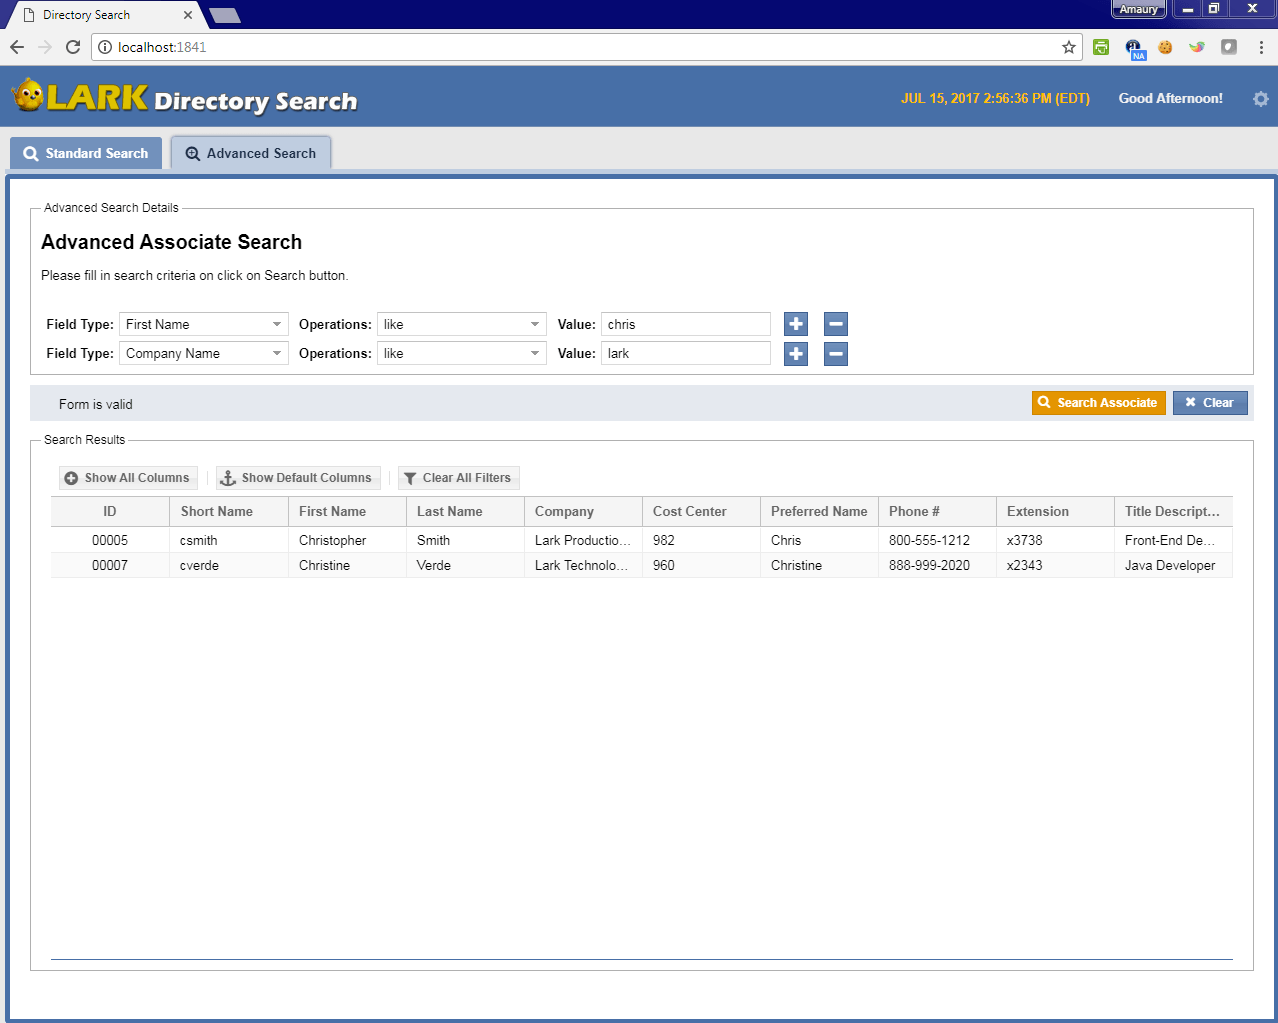 extjsDirectoryAdvSearch